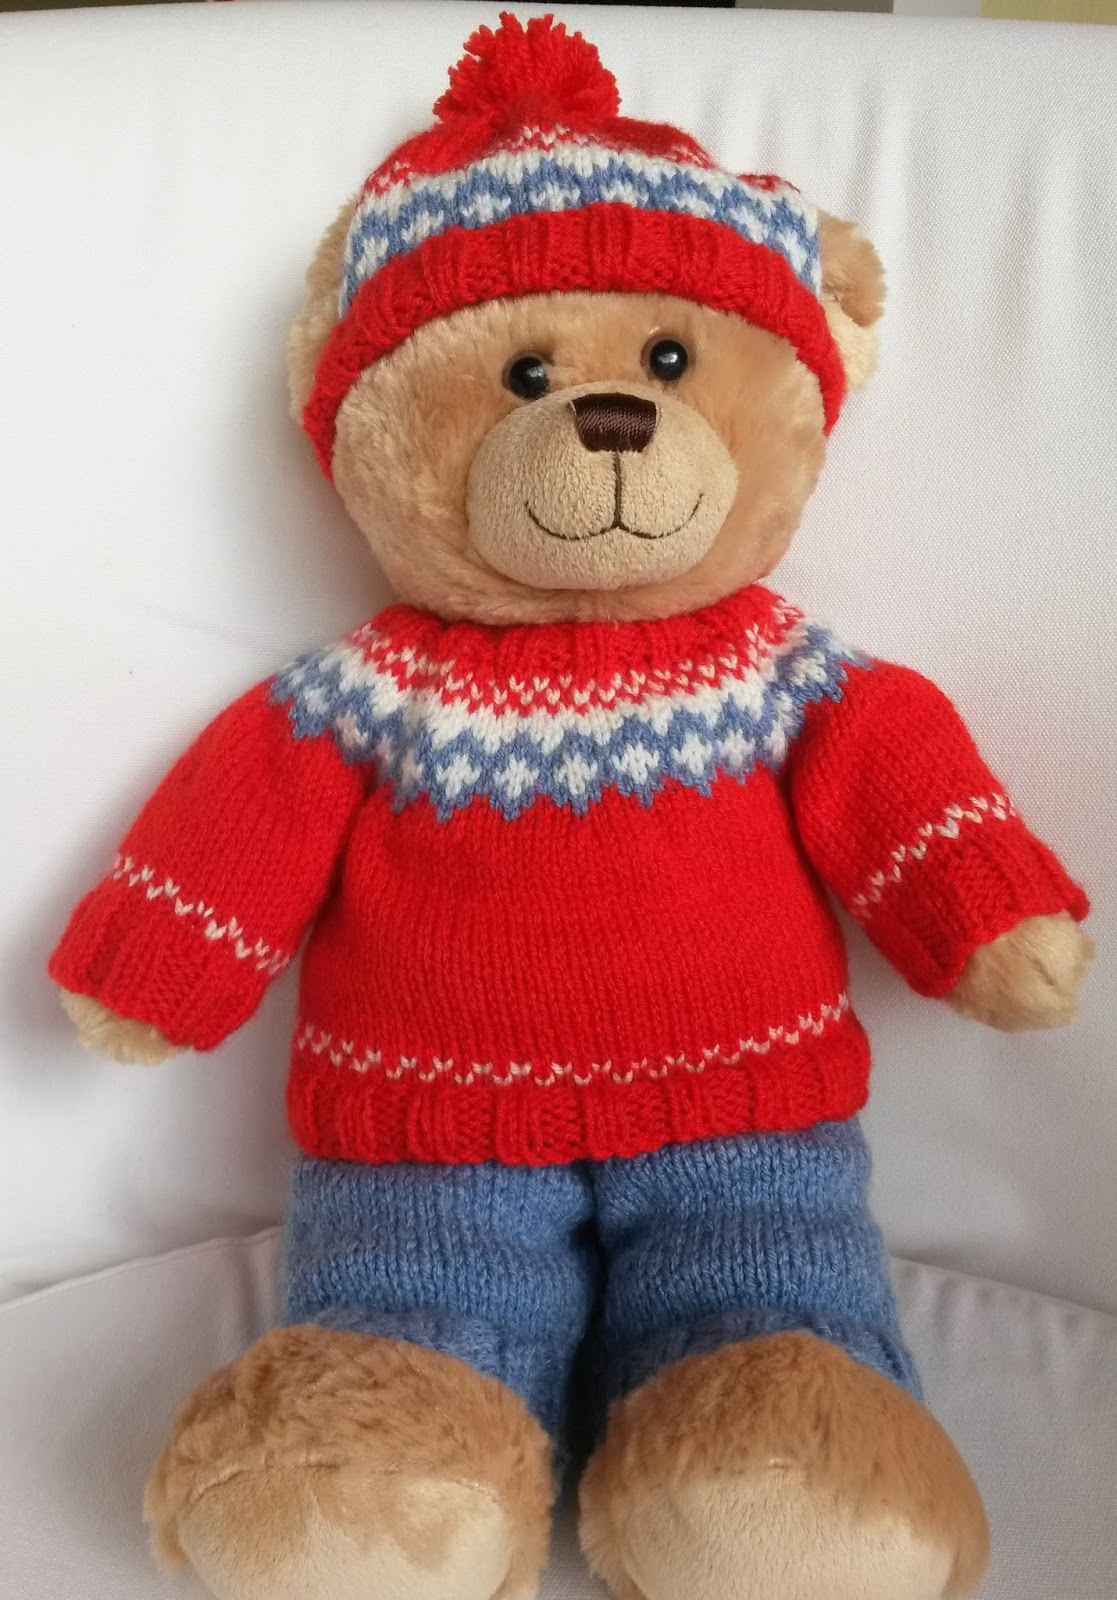 SIMPLE crochet teddy bear tutorial part 1 / beginner friendly ... | 1600x1117